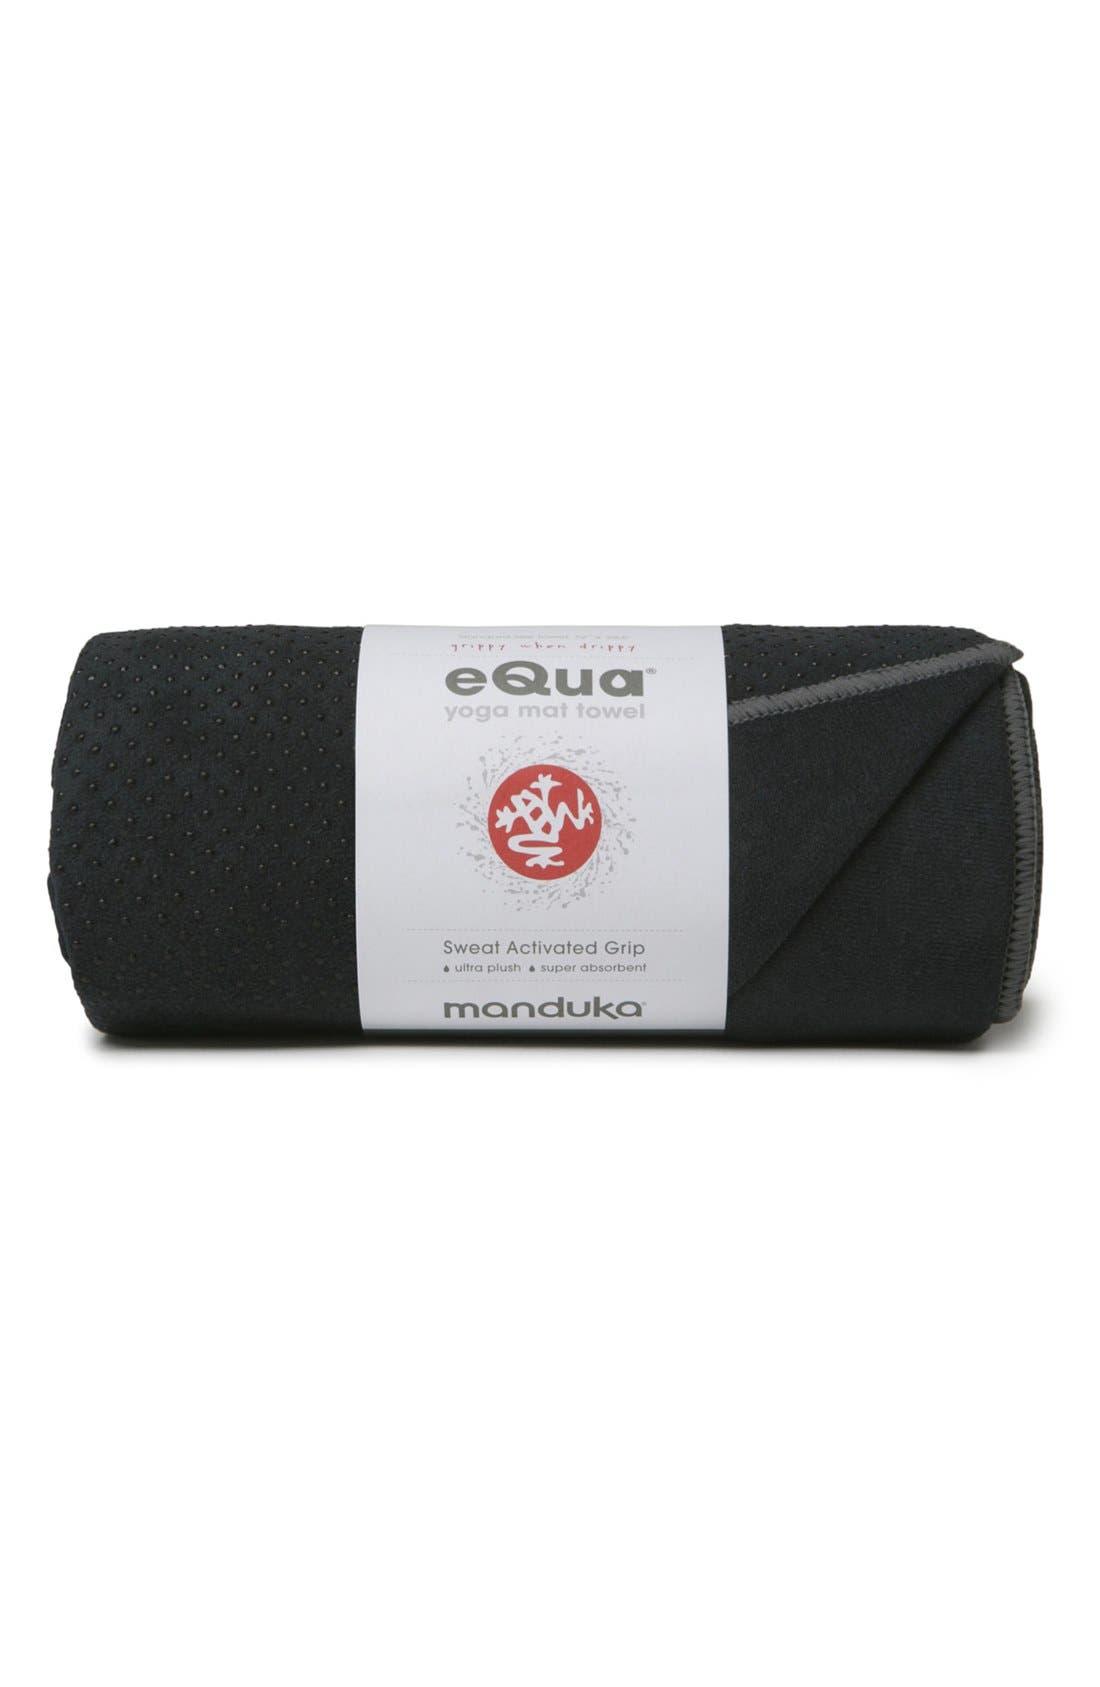 'eQua Hold' Yoga Mat Towel,                         Main,                         color,